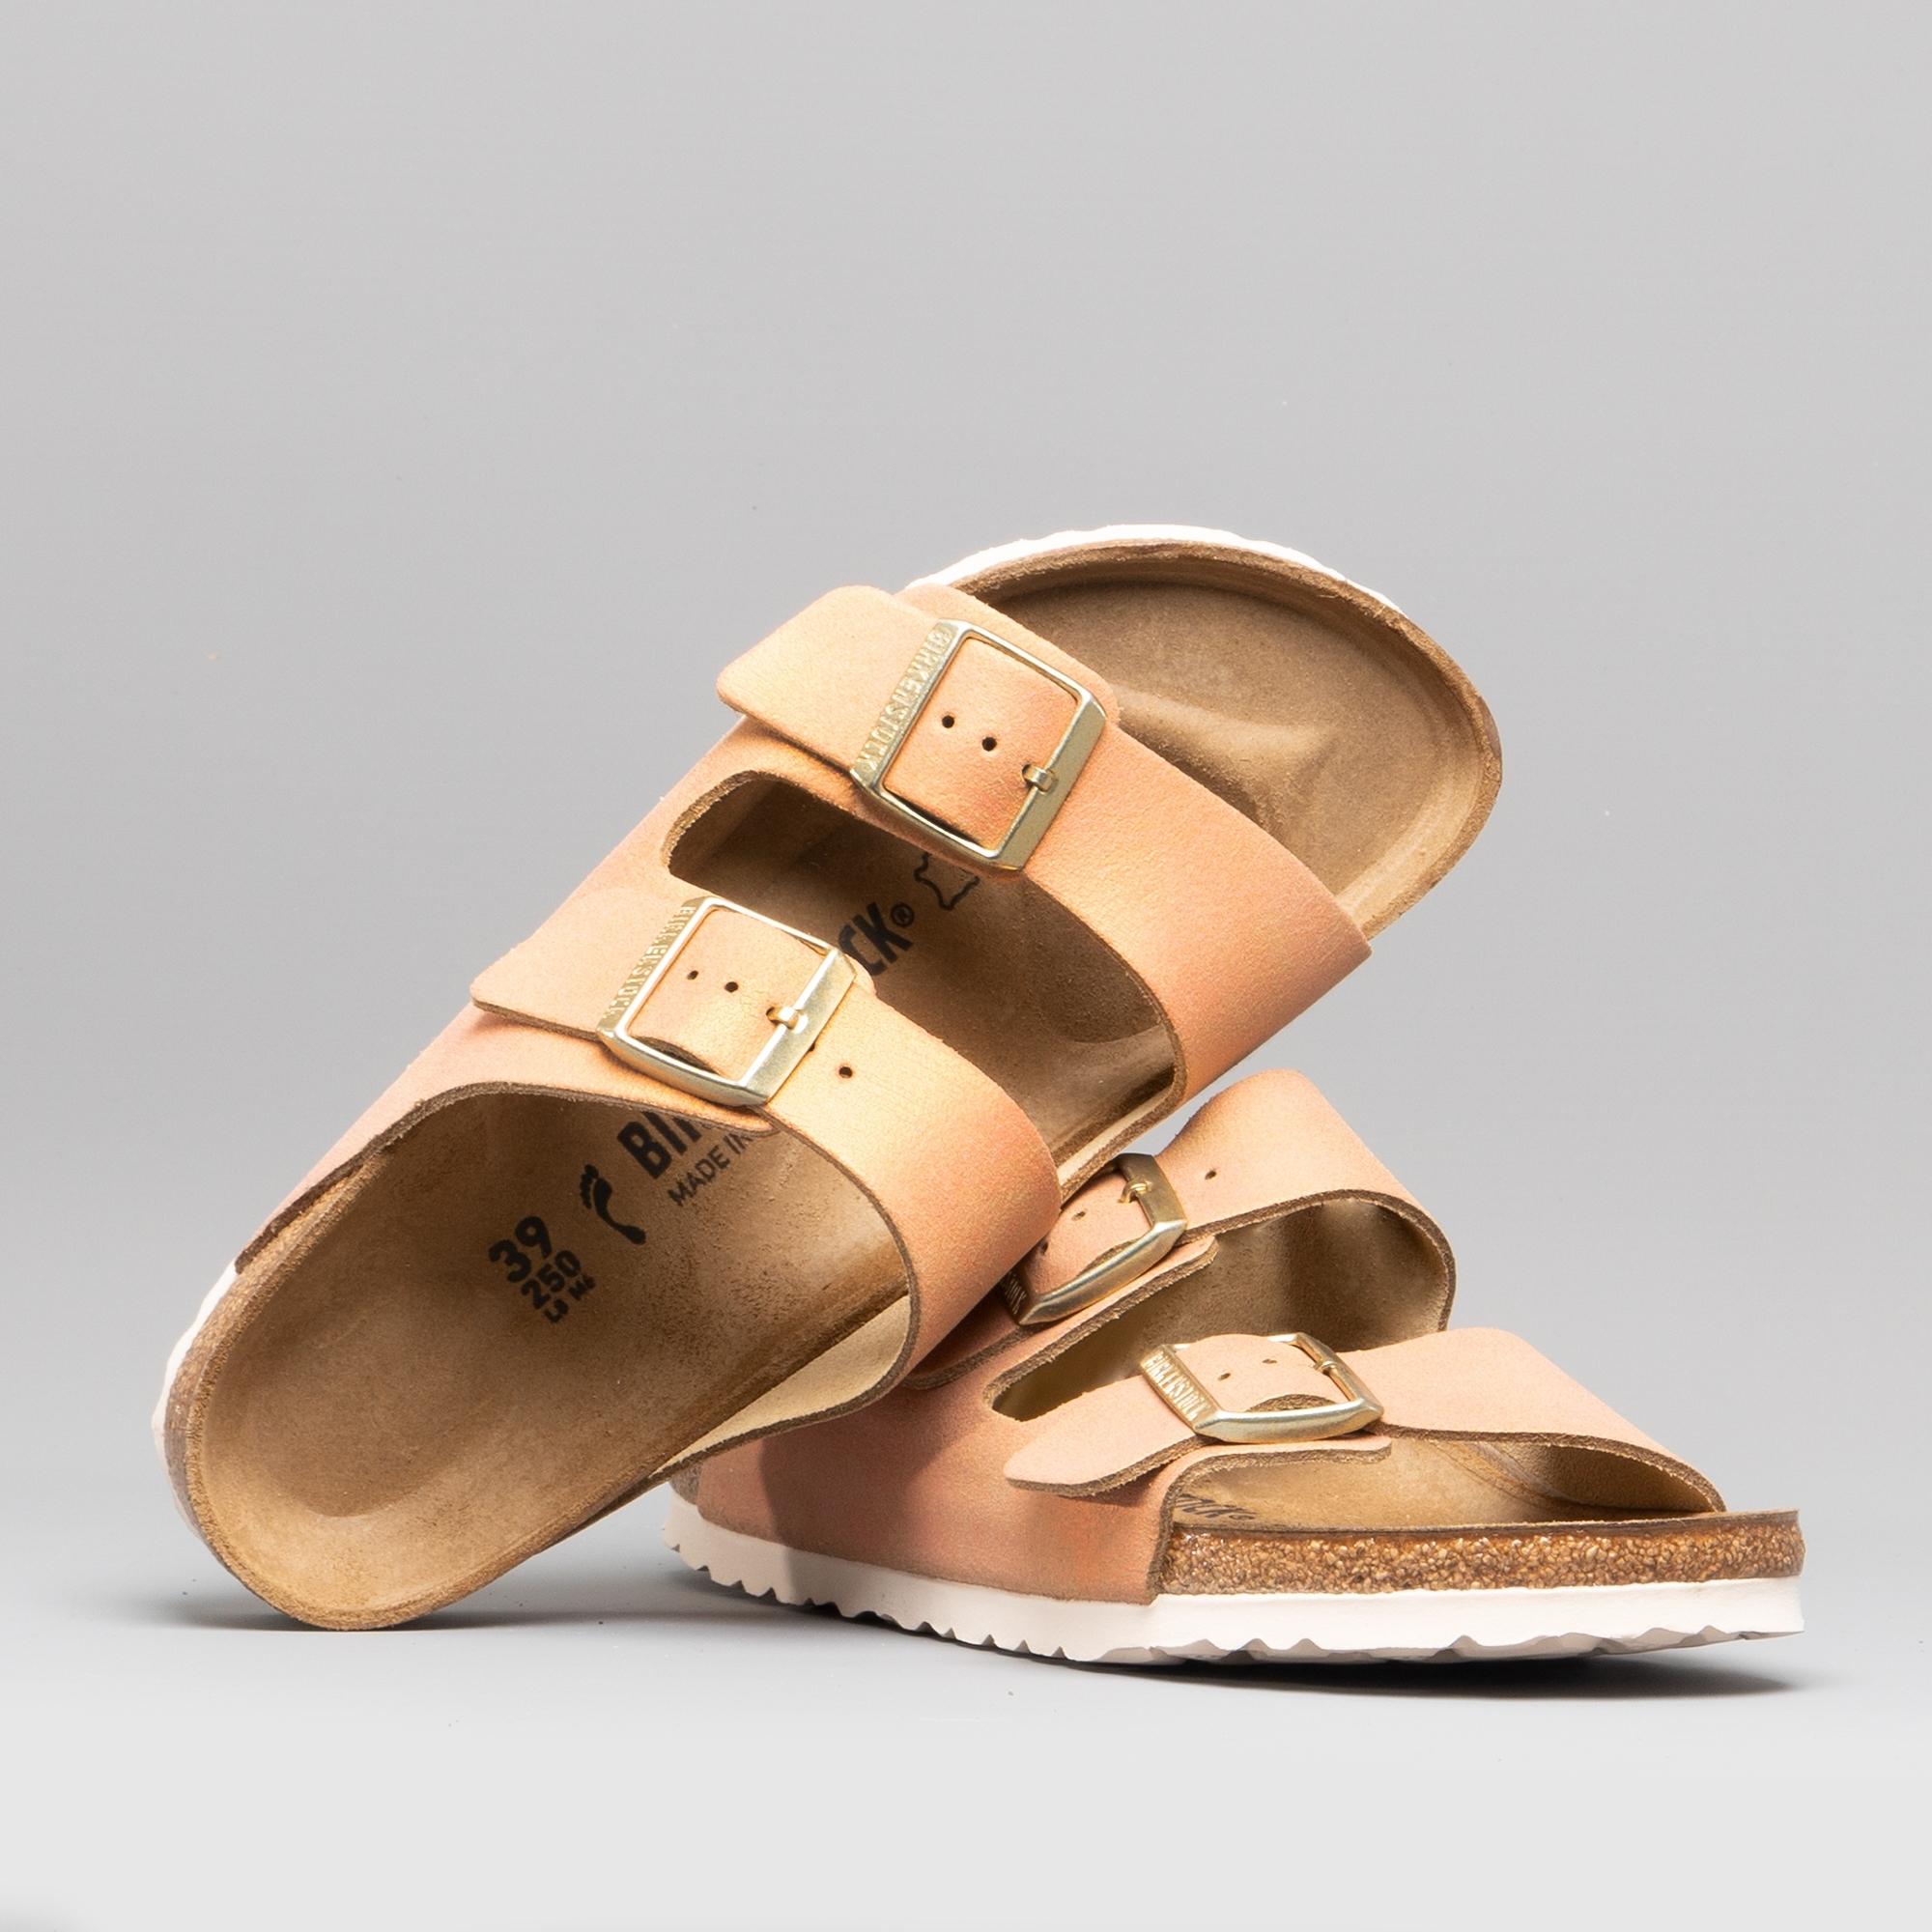 0555df0cd947 Birkenstock ARIZONA 1012902 (Nar) Ladies Suede Two Strap Sandals Washed  Metallic Sea Copper | Shuperb